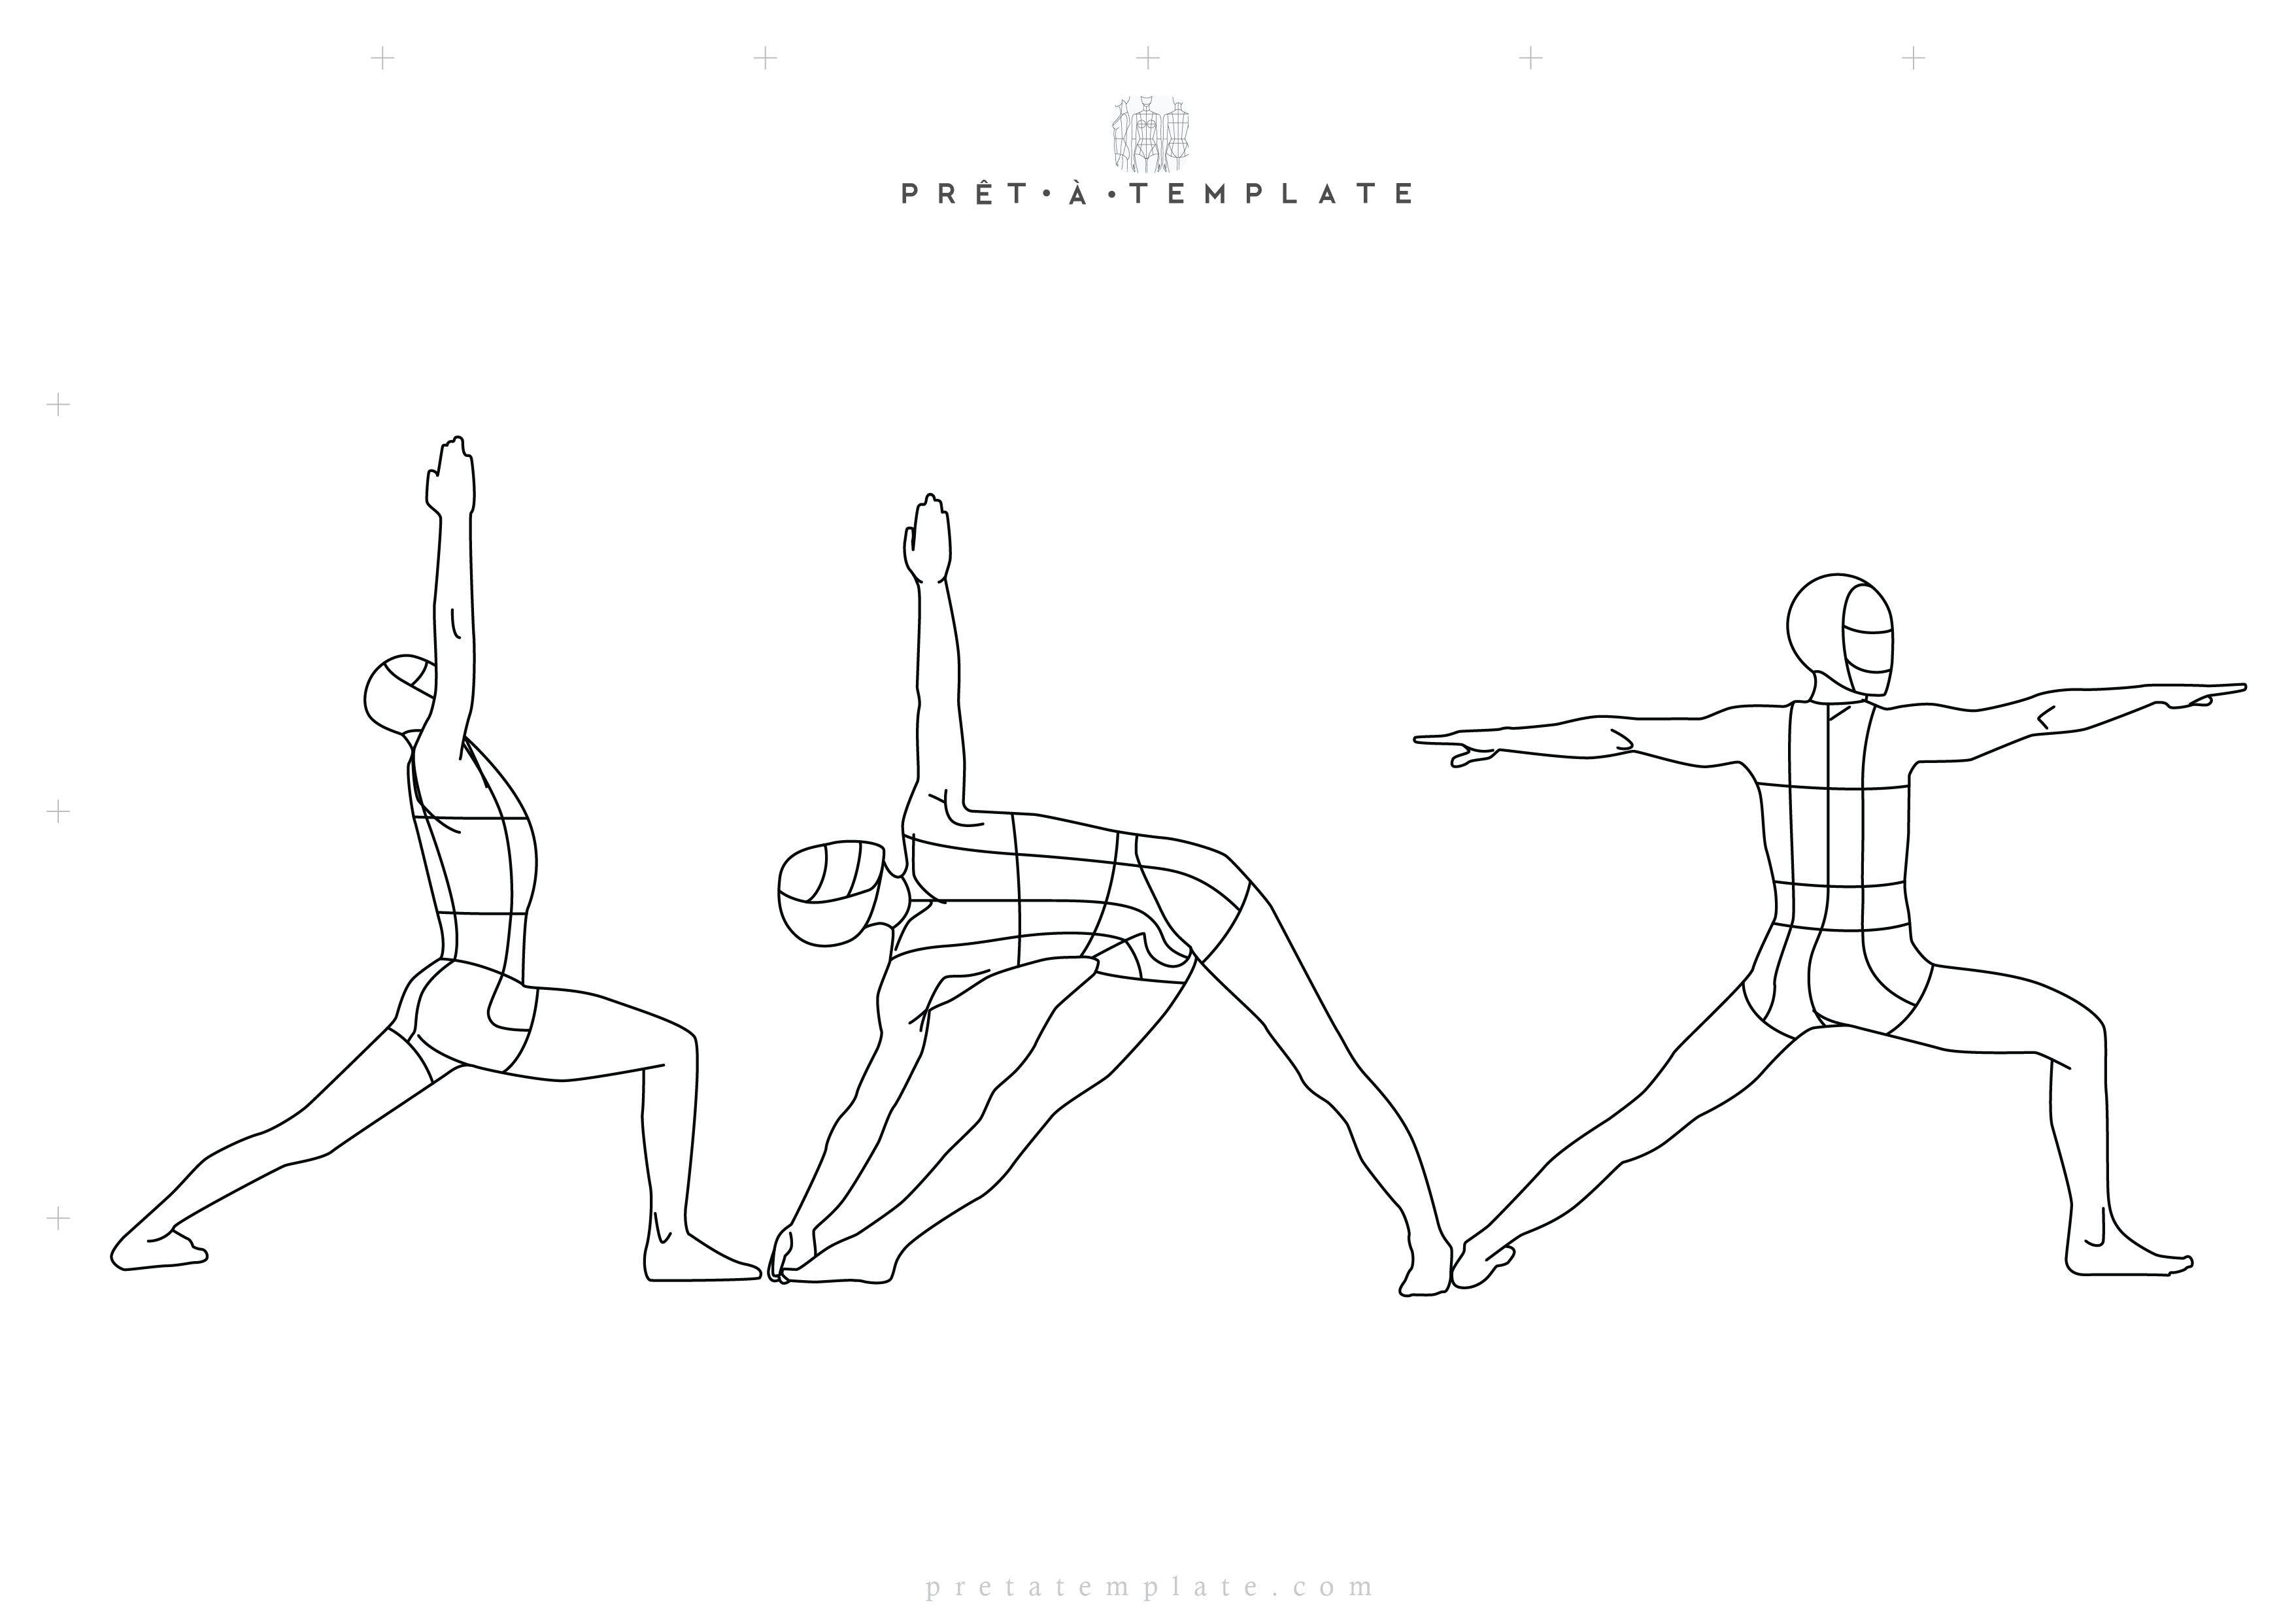 YOGA MAN body figure fashion template for yoga clothing (D